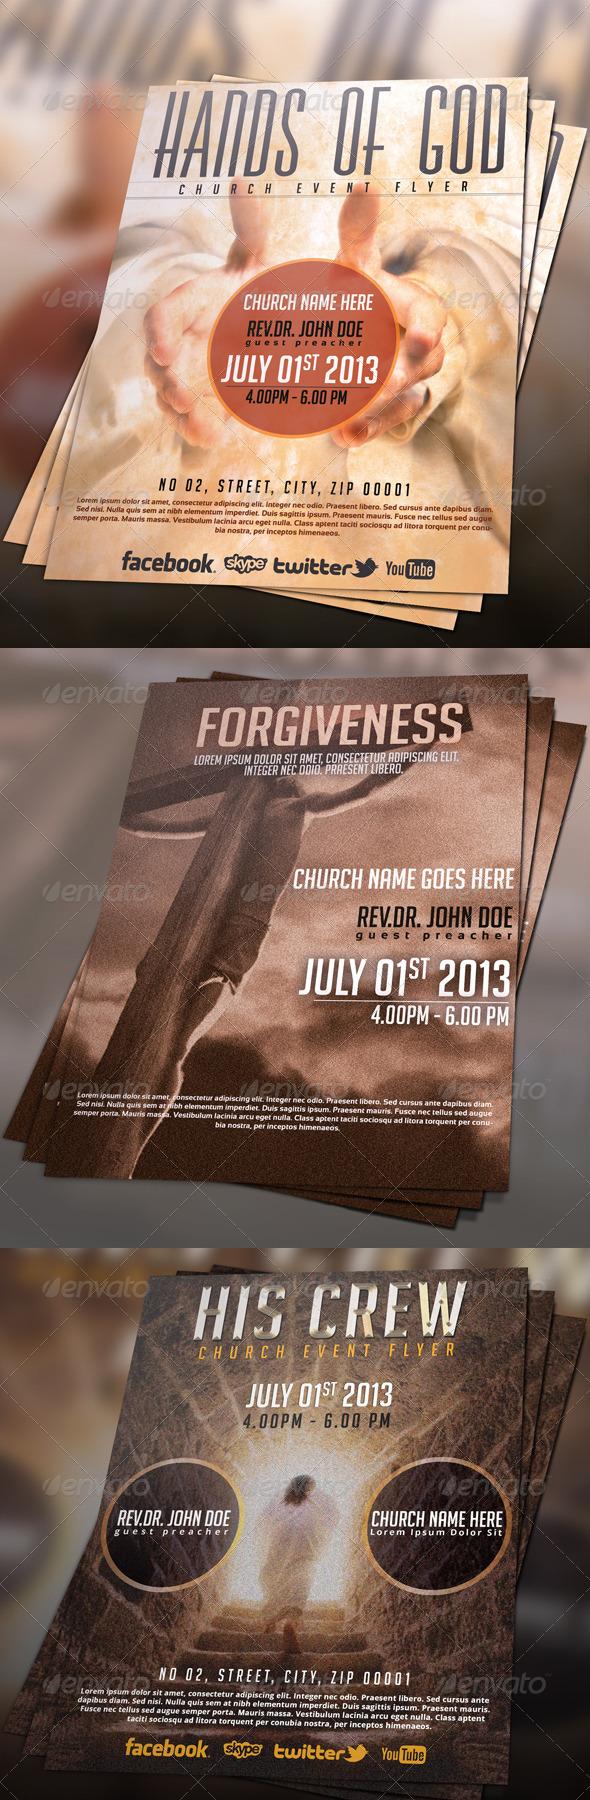 Church Flyer/Poster Bundle 01 - Church Flyers